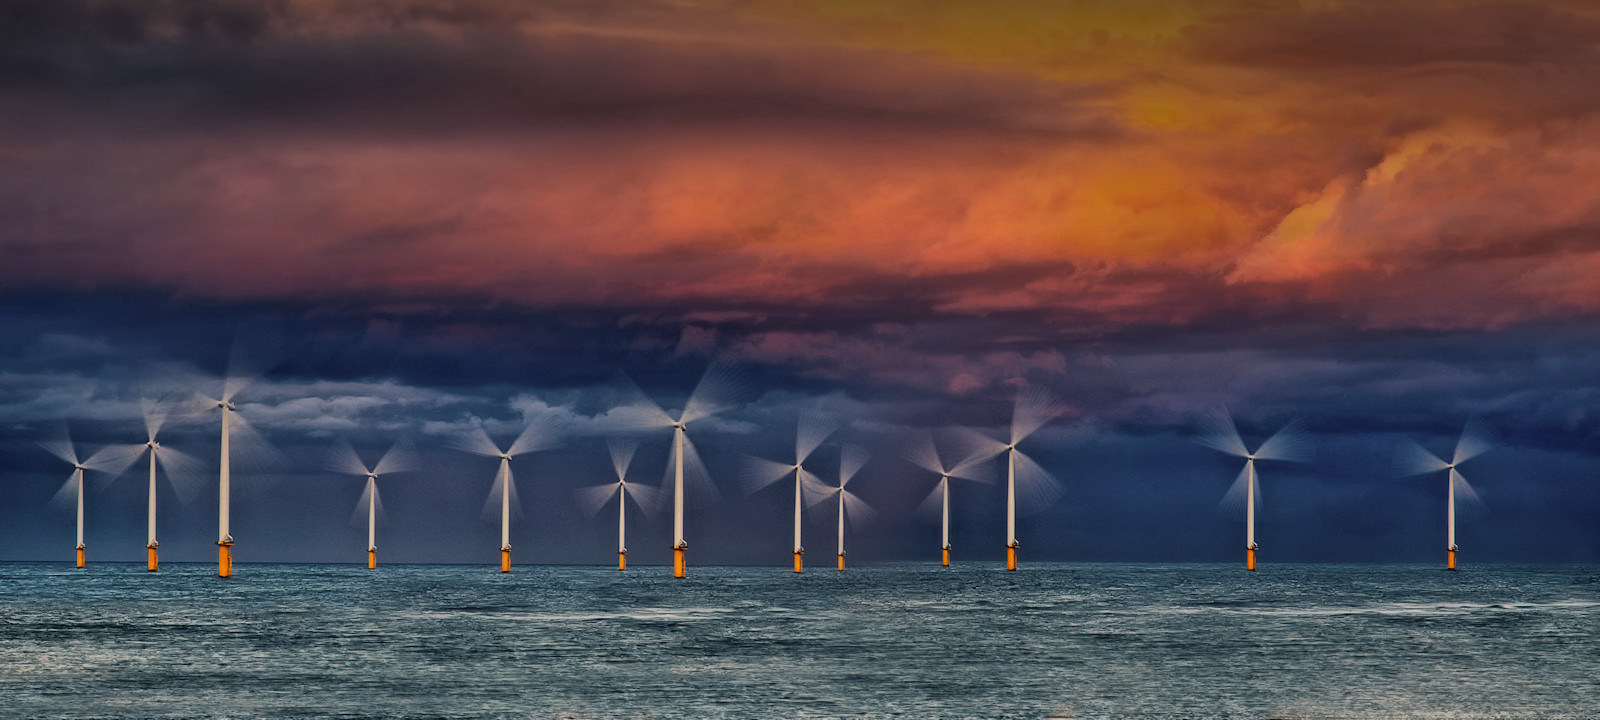 COLOUR - Storm Power by Joe Beattie (12 marks)